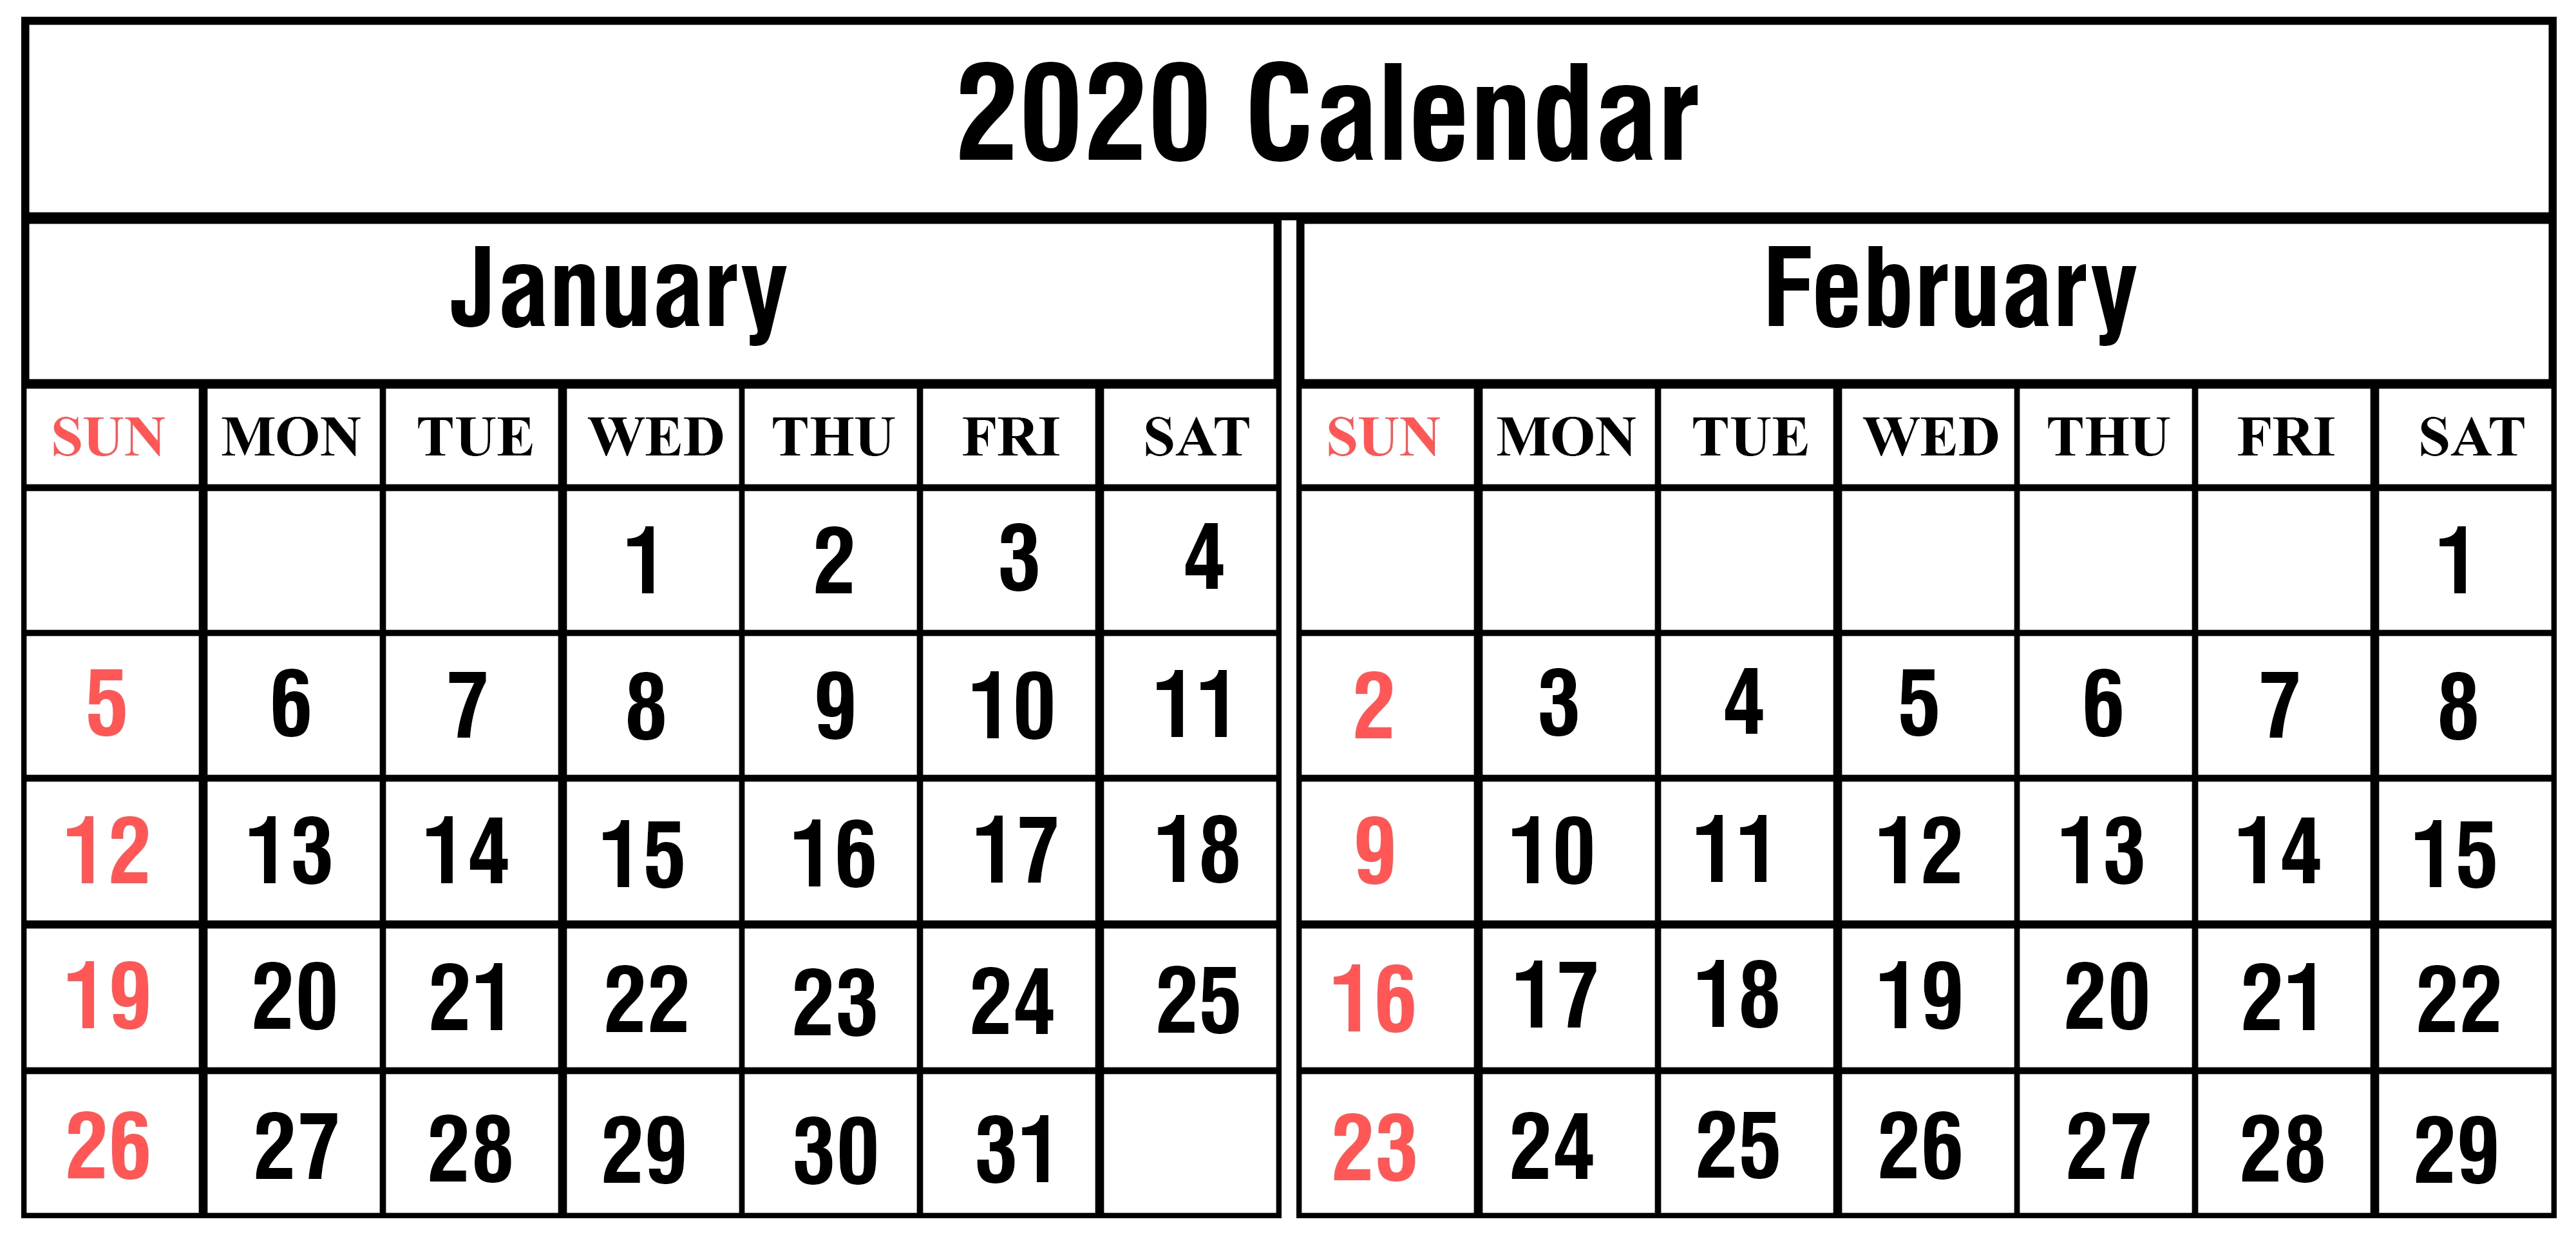 Free January And February 2020 Calendar Printable Templates-January 2020 Calendar Sri Lanka